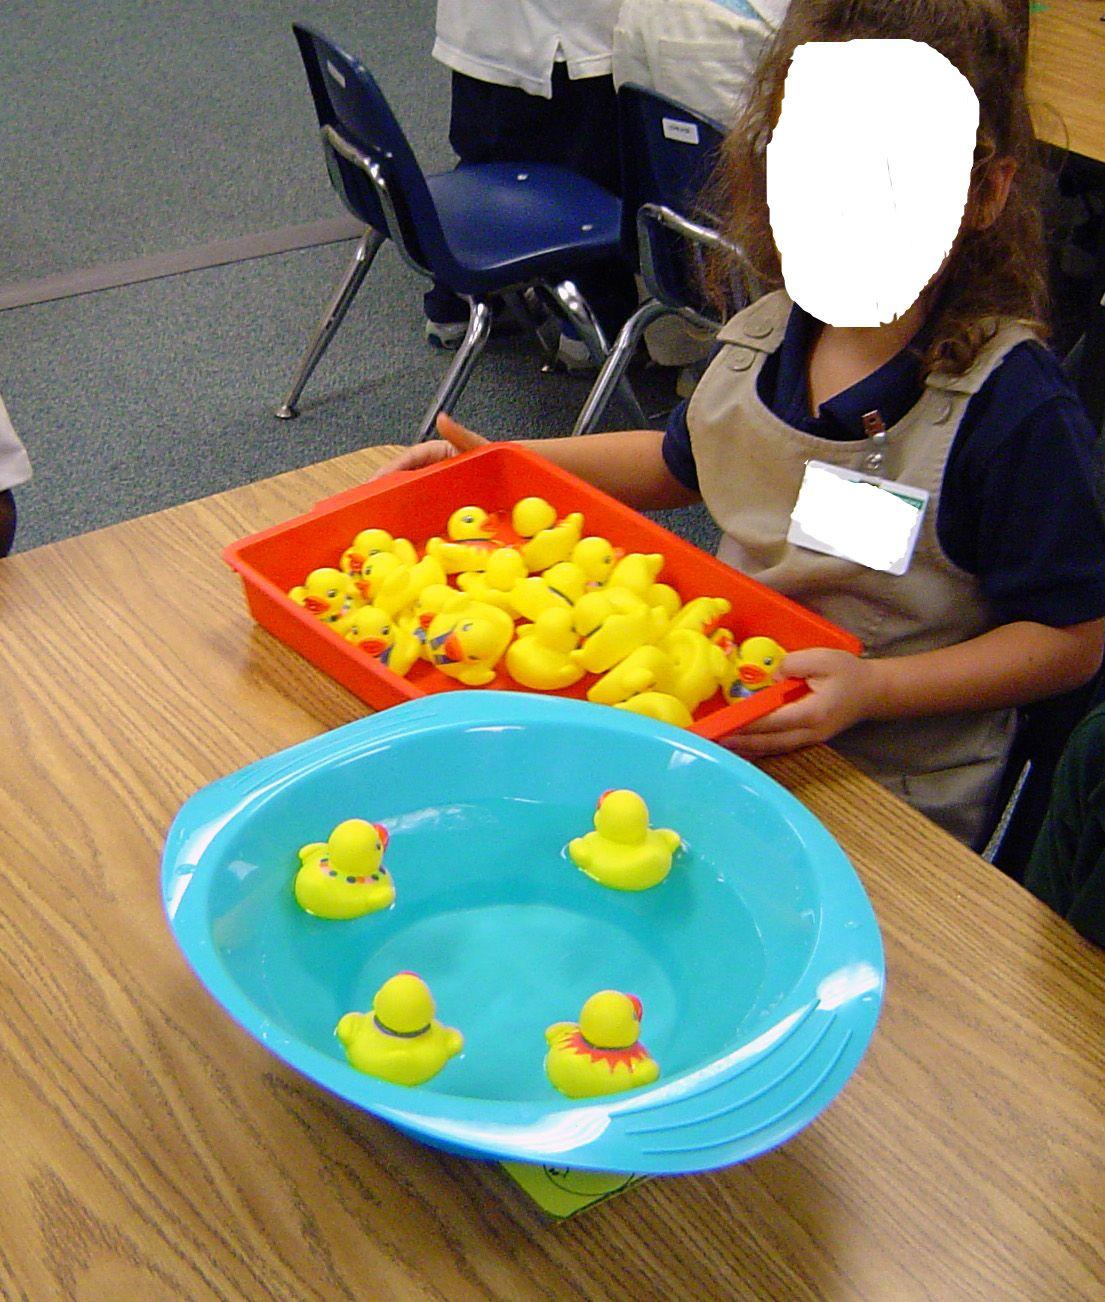 One To One Correspondence Activities For Preschool